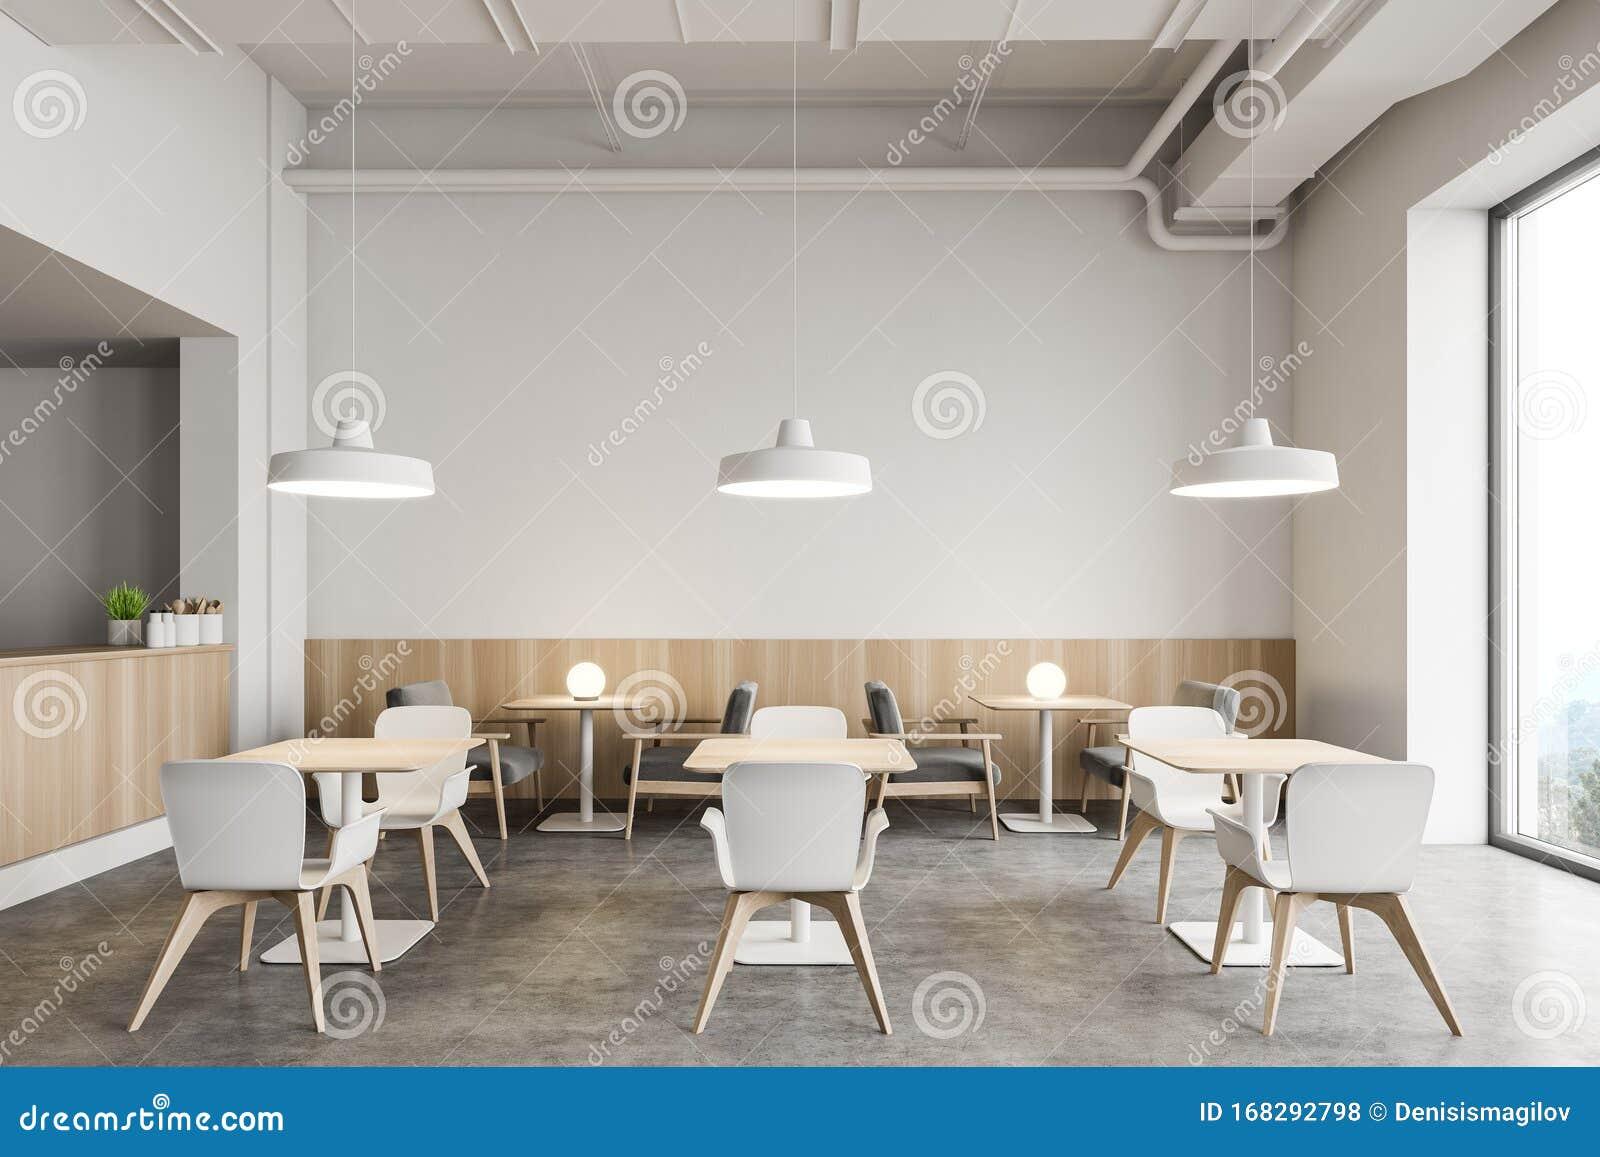 Stylish Industrial Style Restaurant Interior Stock Illustration Illustration Of Dinner Food 168292798